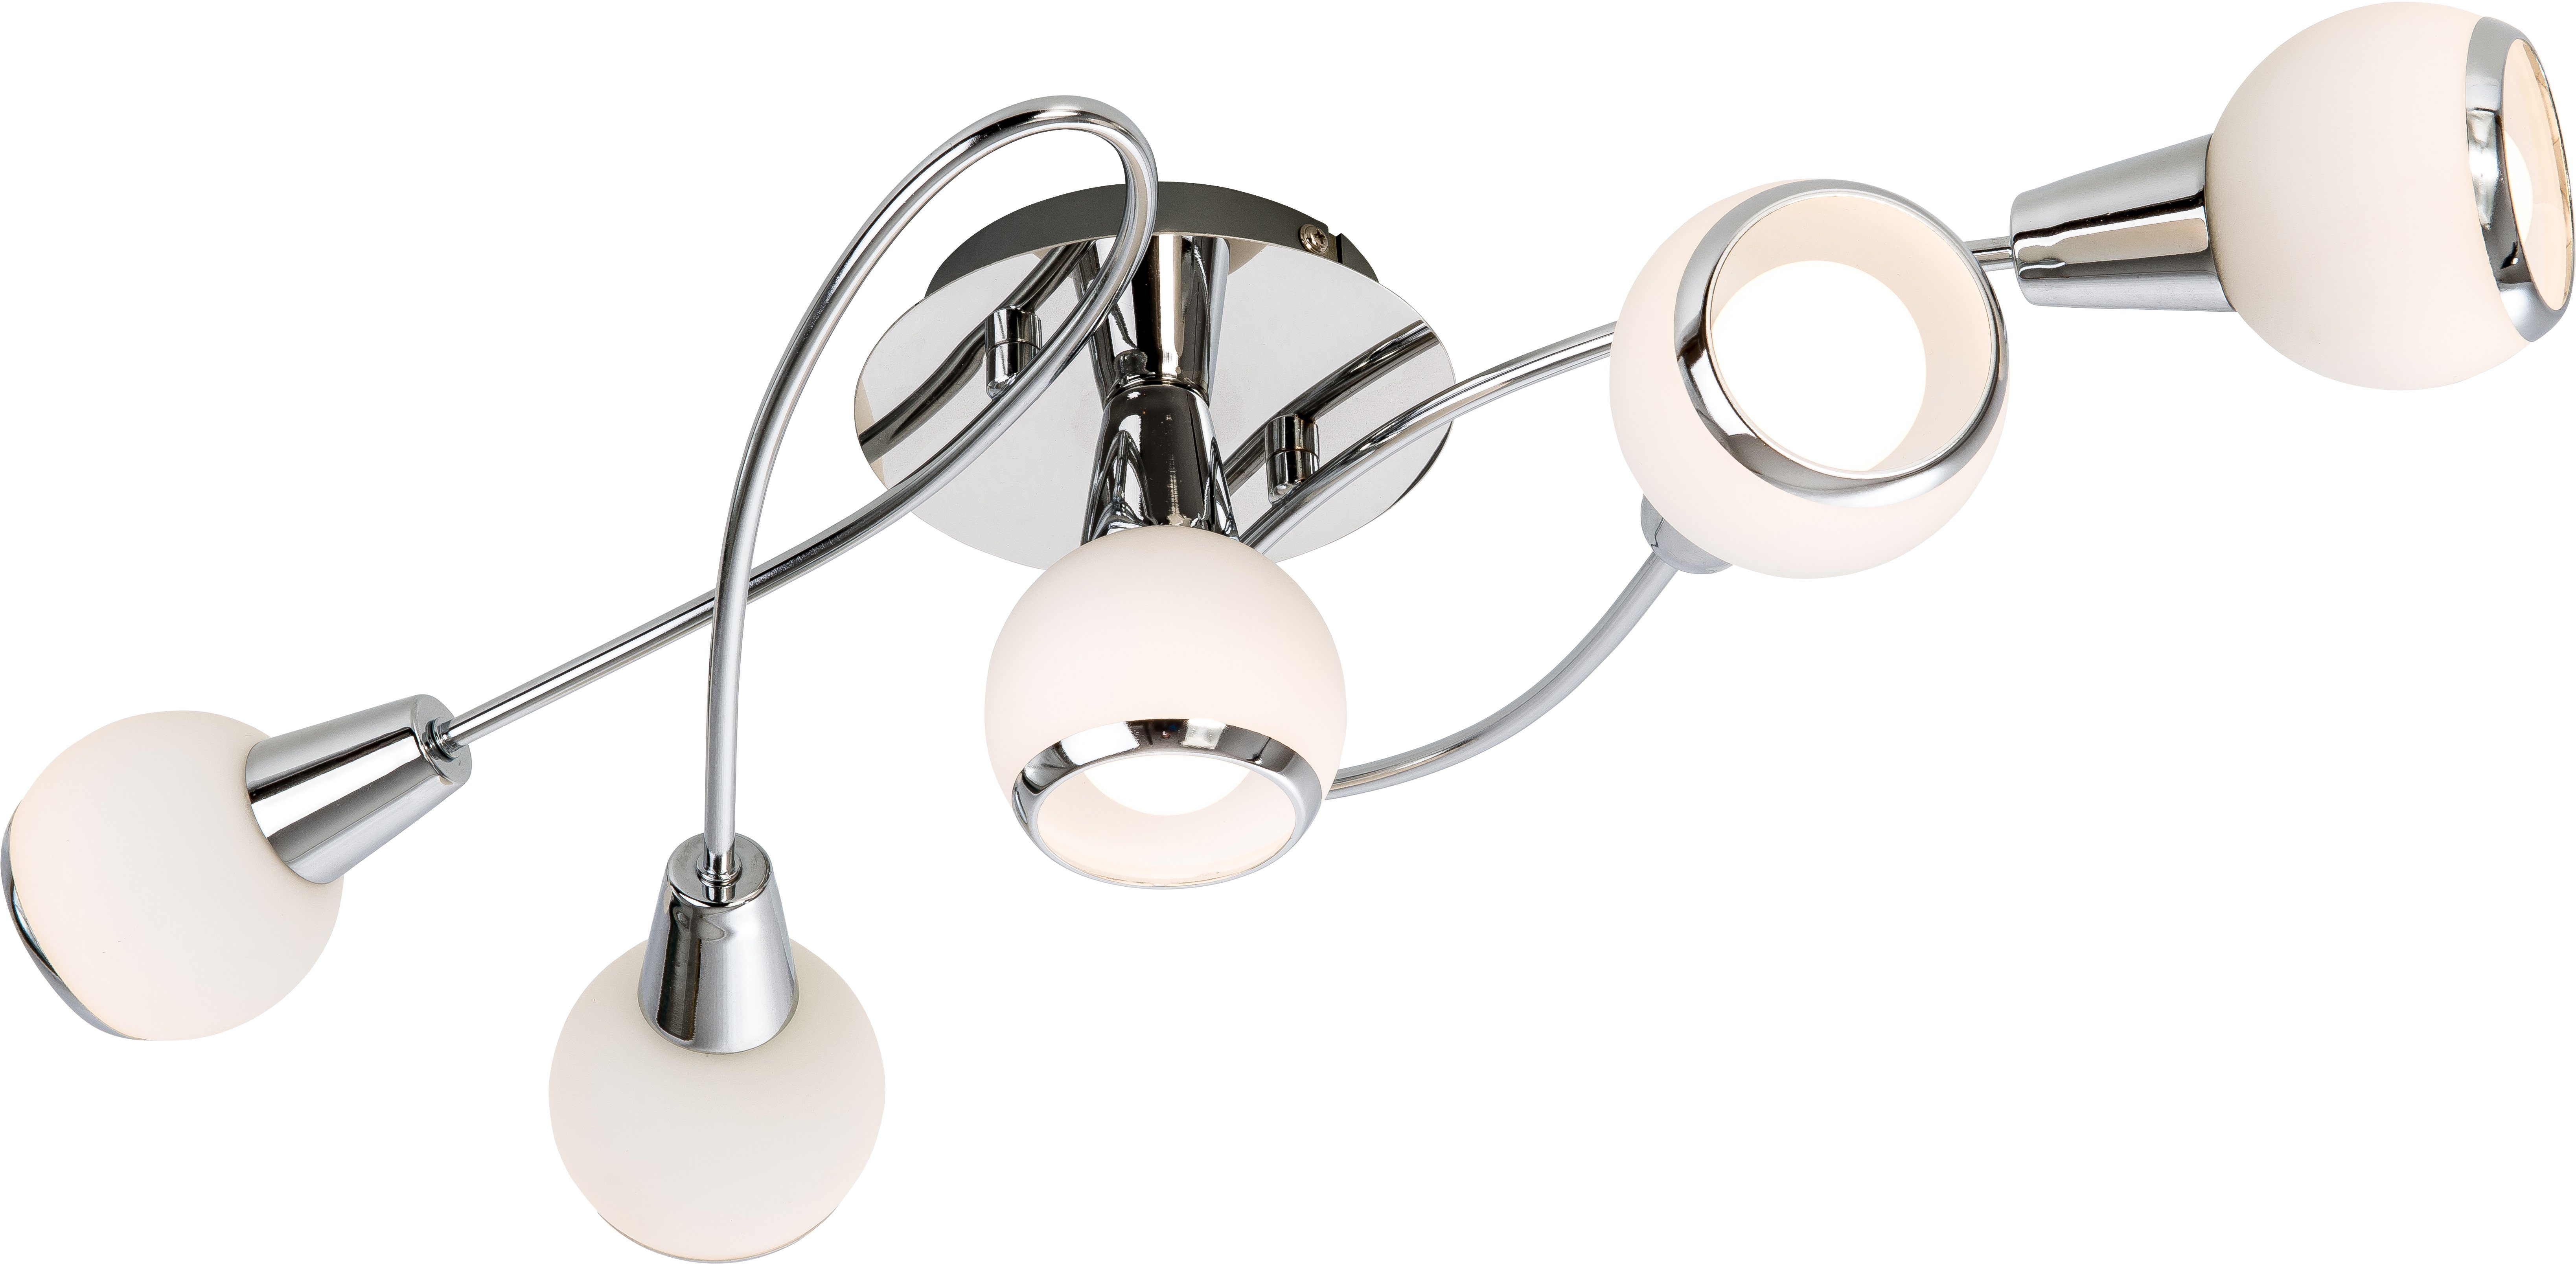 Nino LED-Deckenleuchte, 5flg, »LORIS«